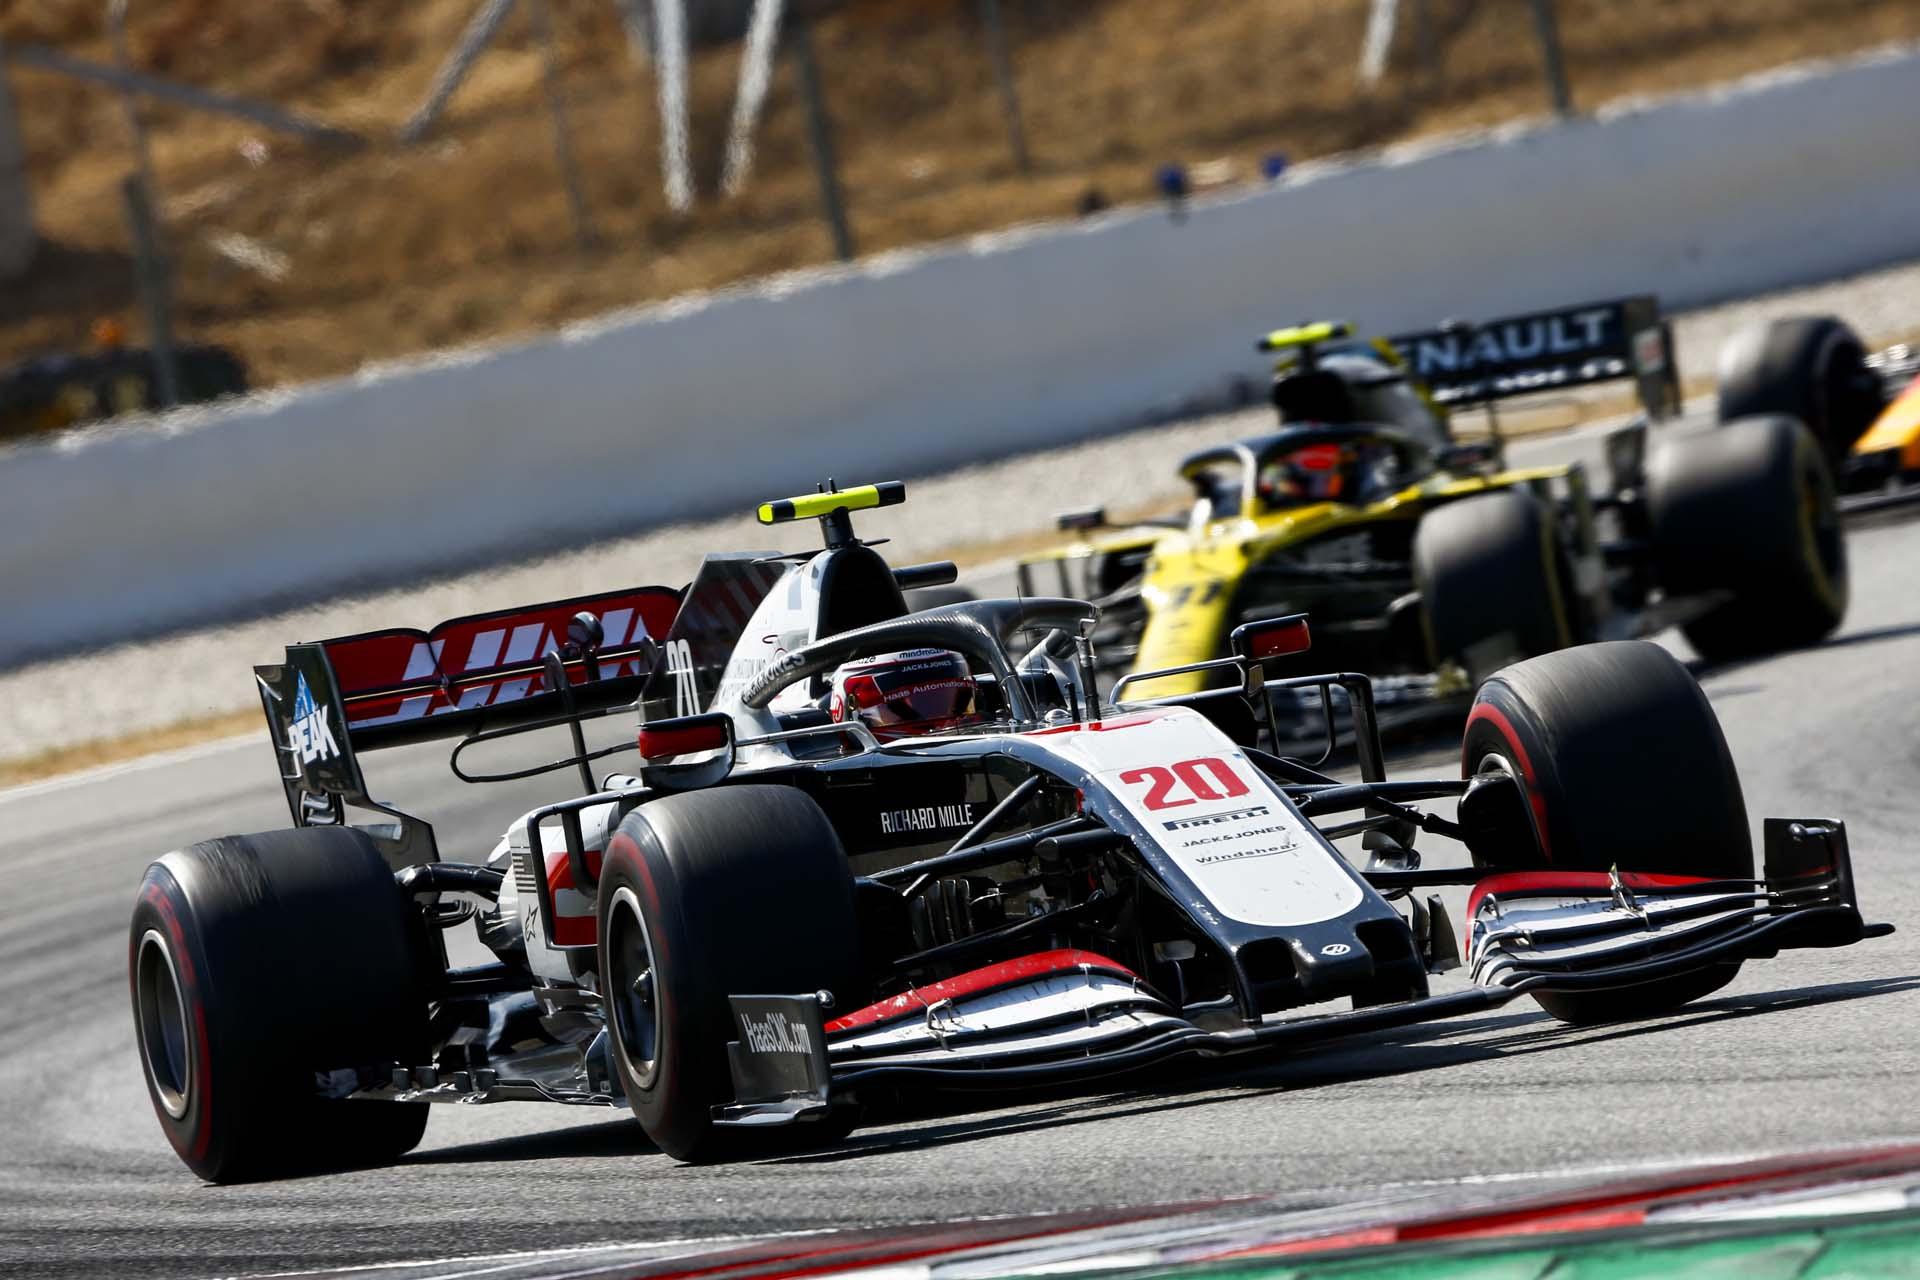 2020 Spanish GP